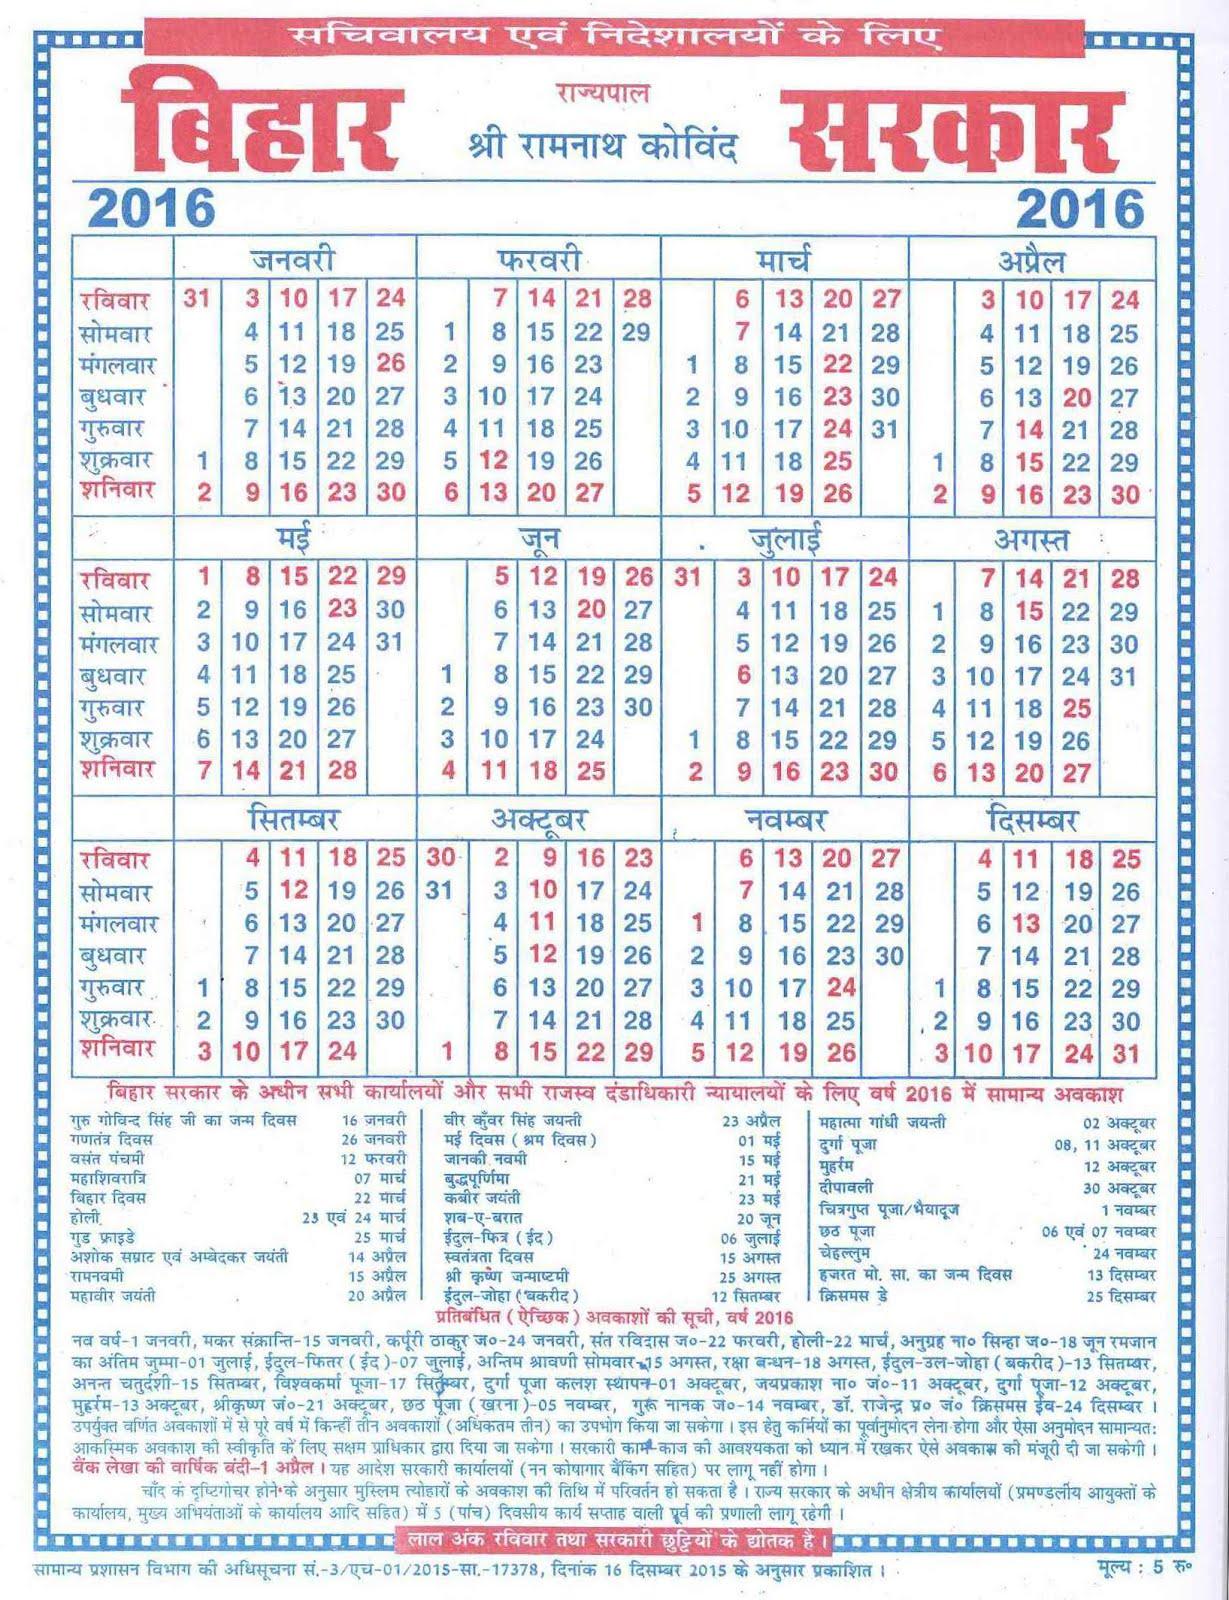 Bihar Government Calendar 2016 within Bihar Goverment Calender 2020